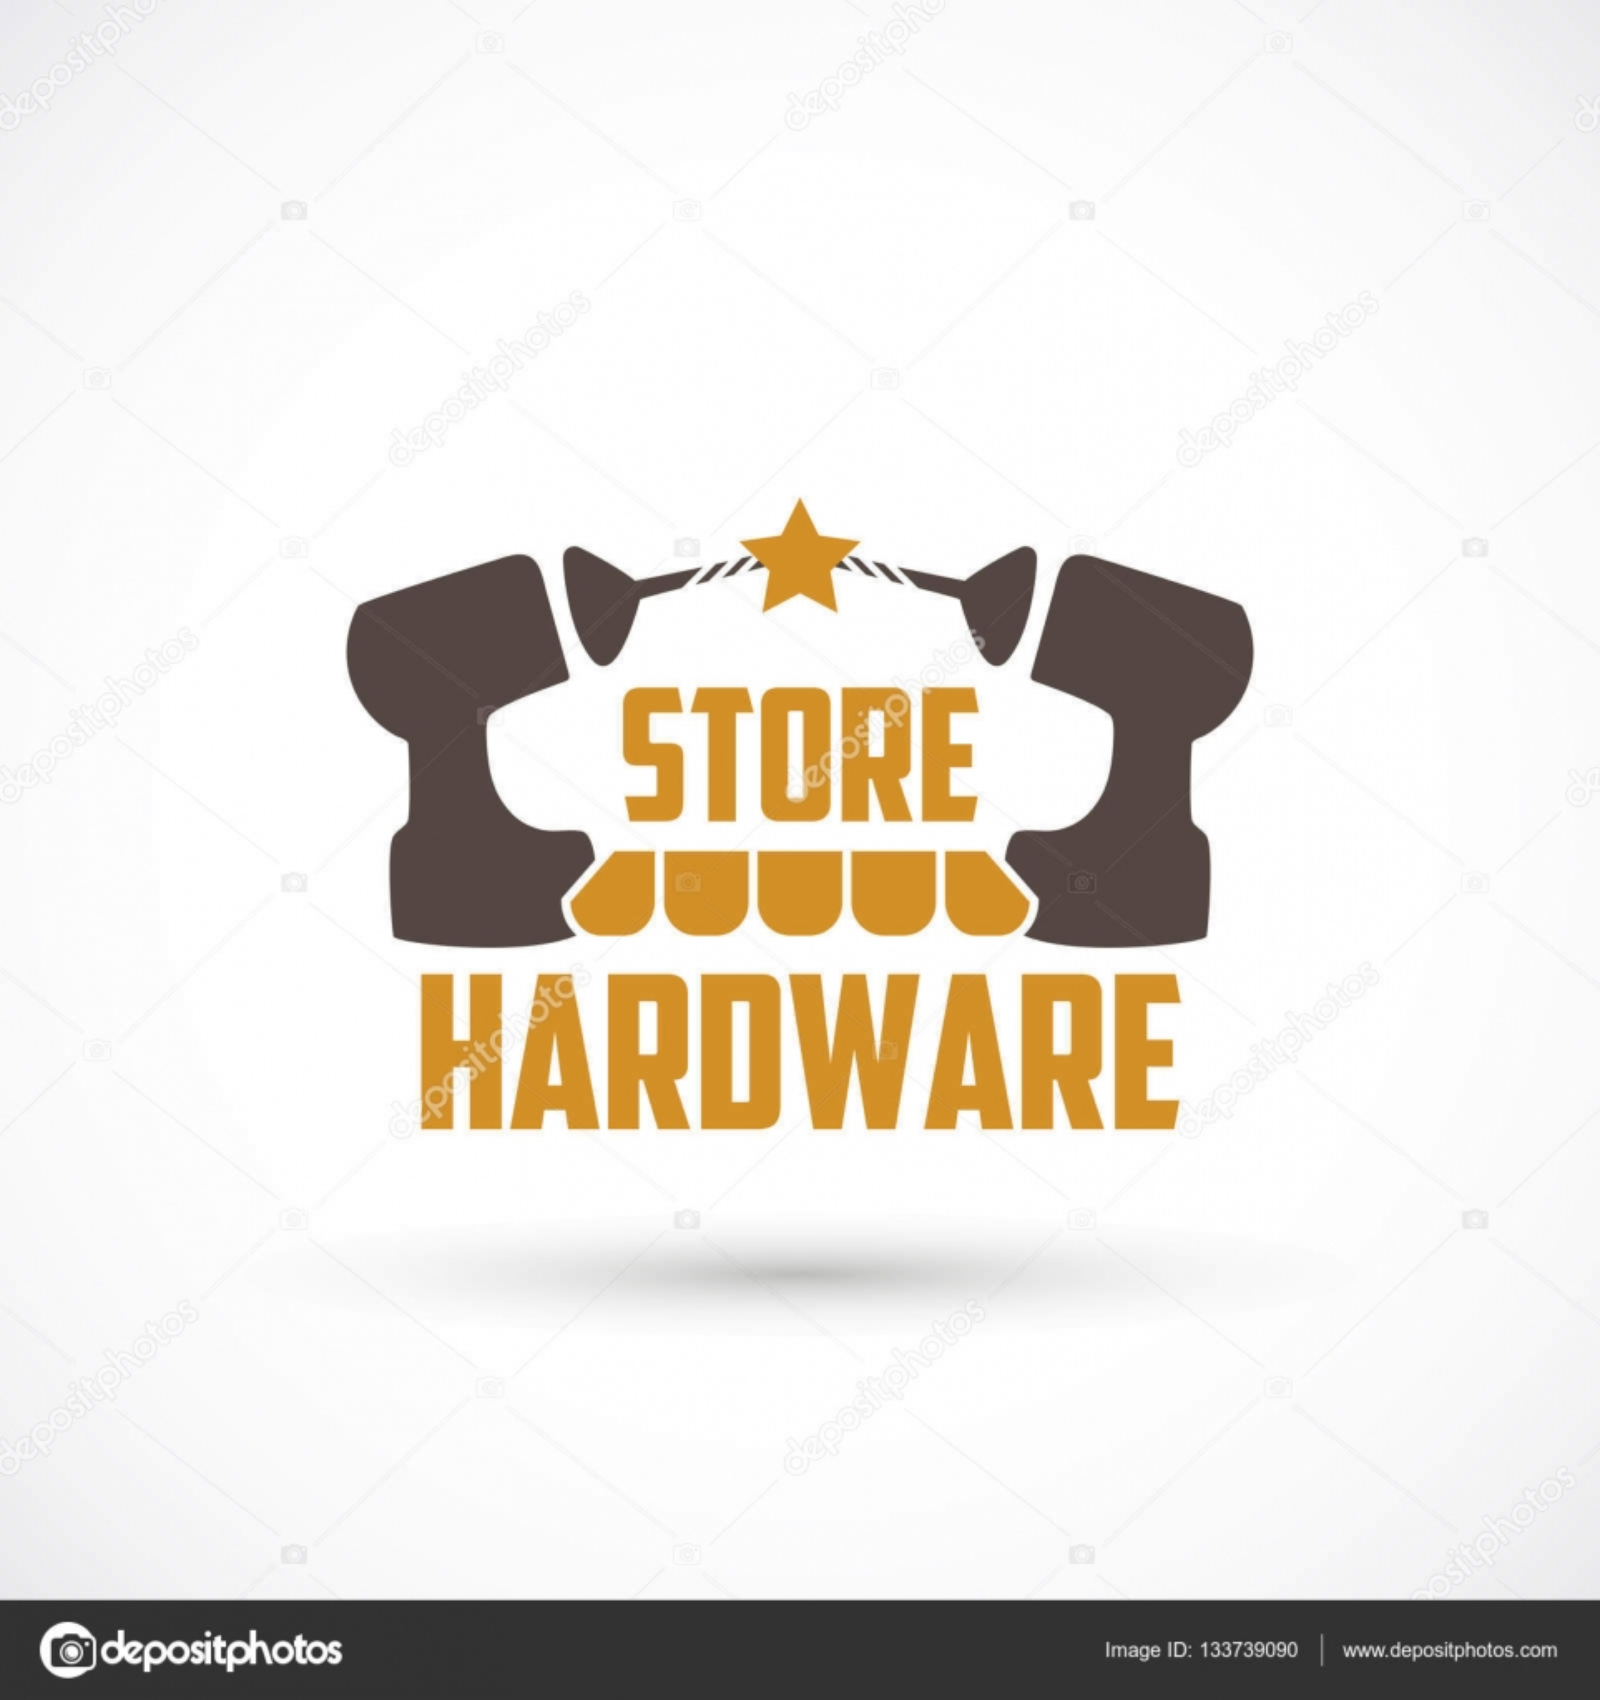 a6ab6ed8f Loja de ferragem forma logotipo — Vetores de Stock © shekaka #133739090